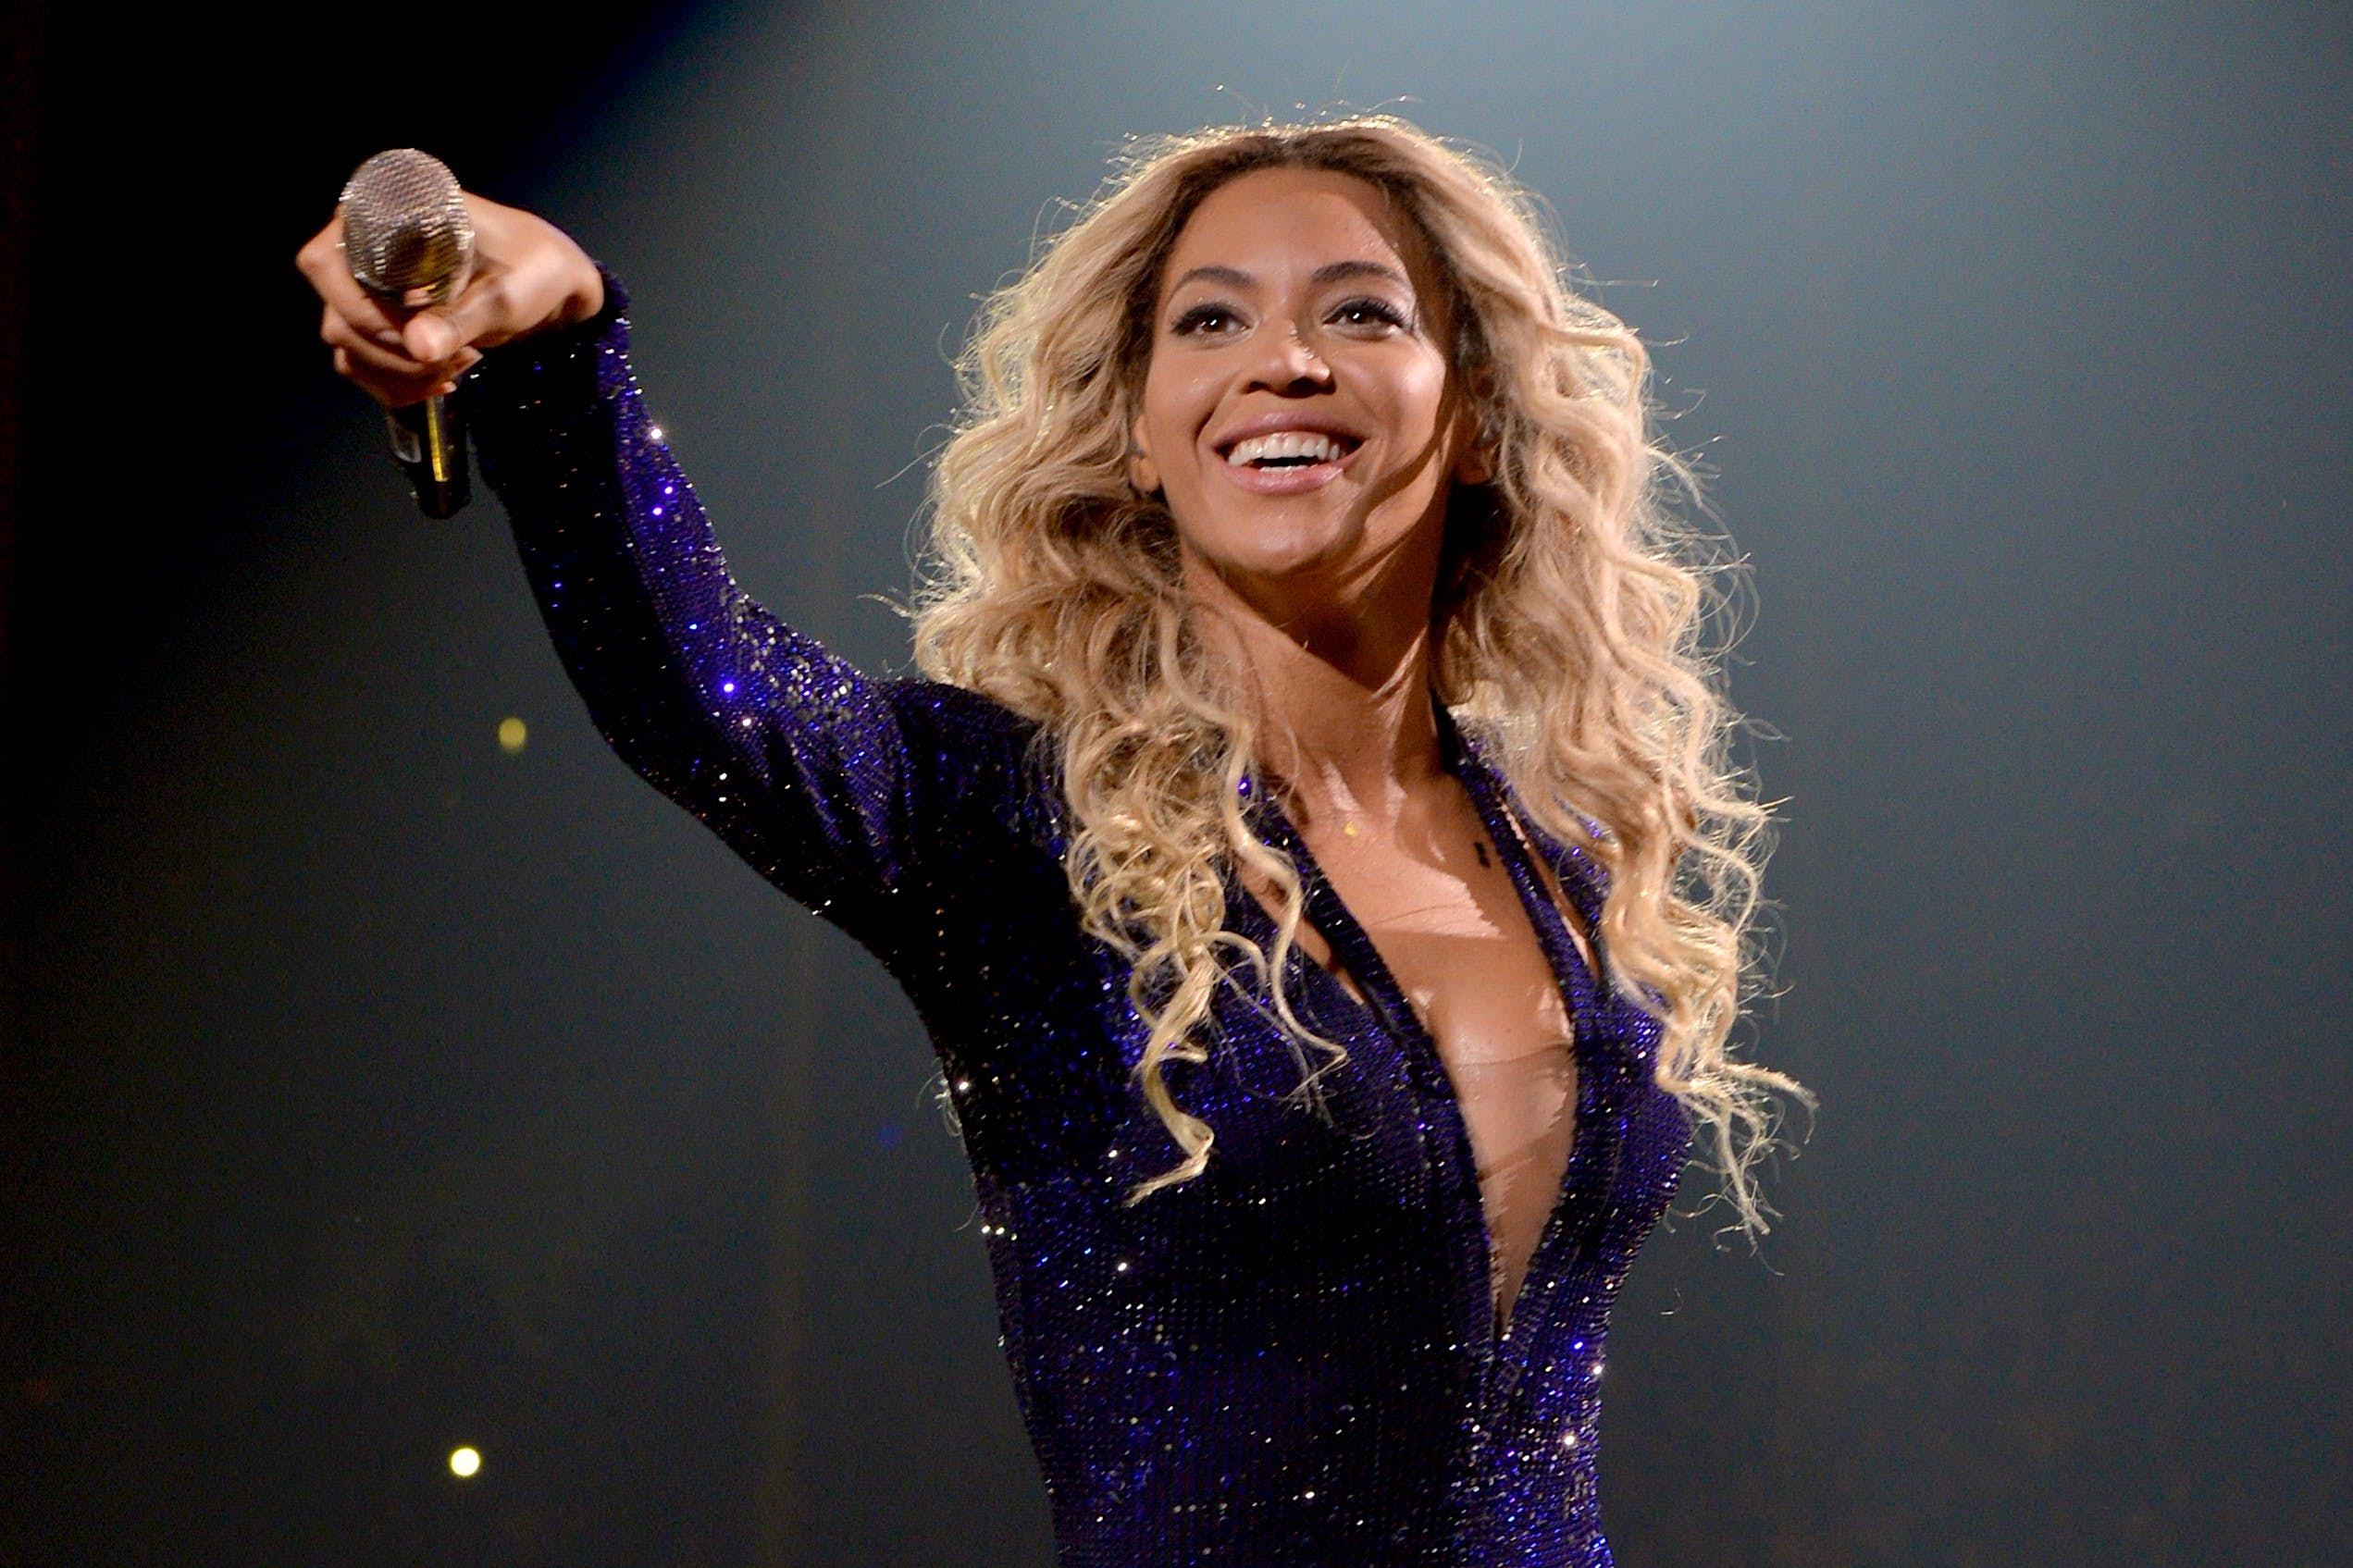 Singer-songwriter Beyoncé Knowles on stage